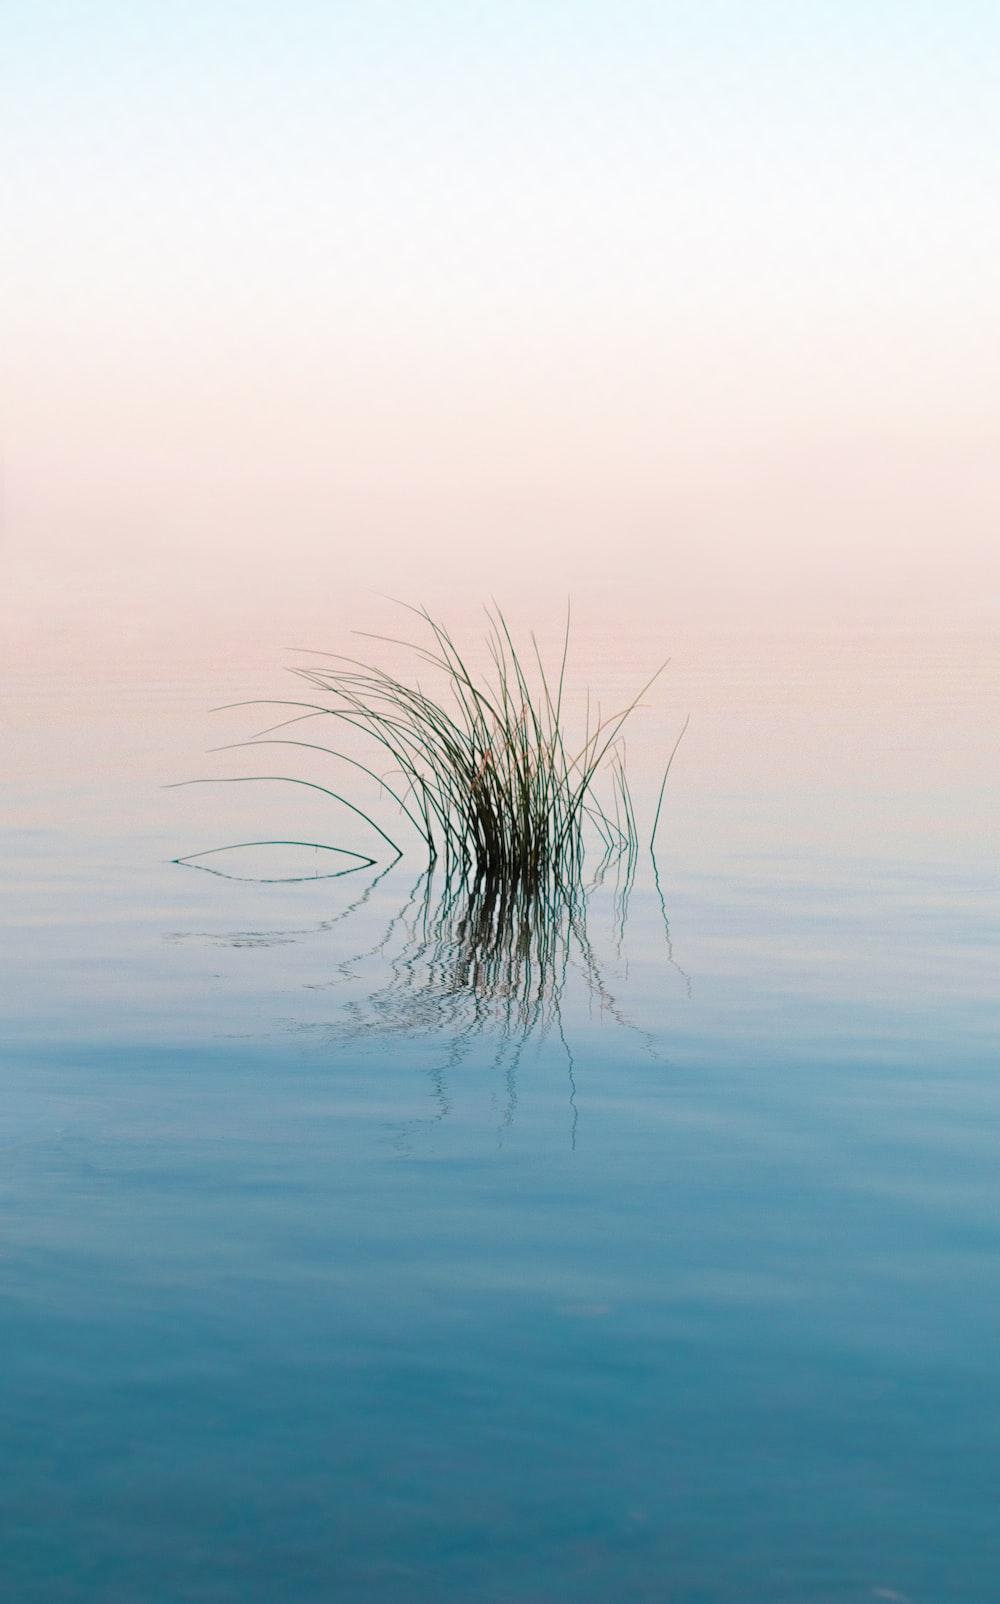 green grass on blue water